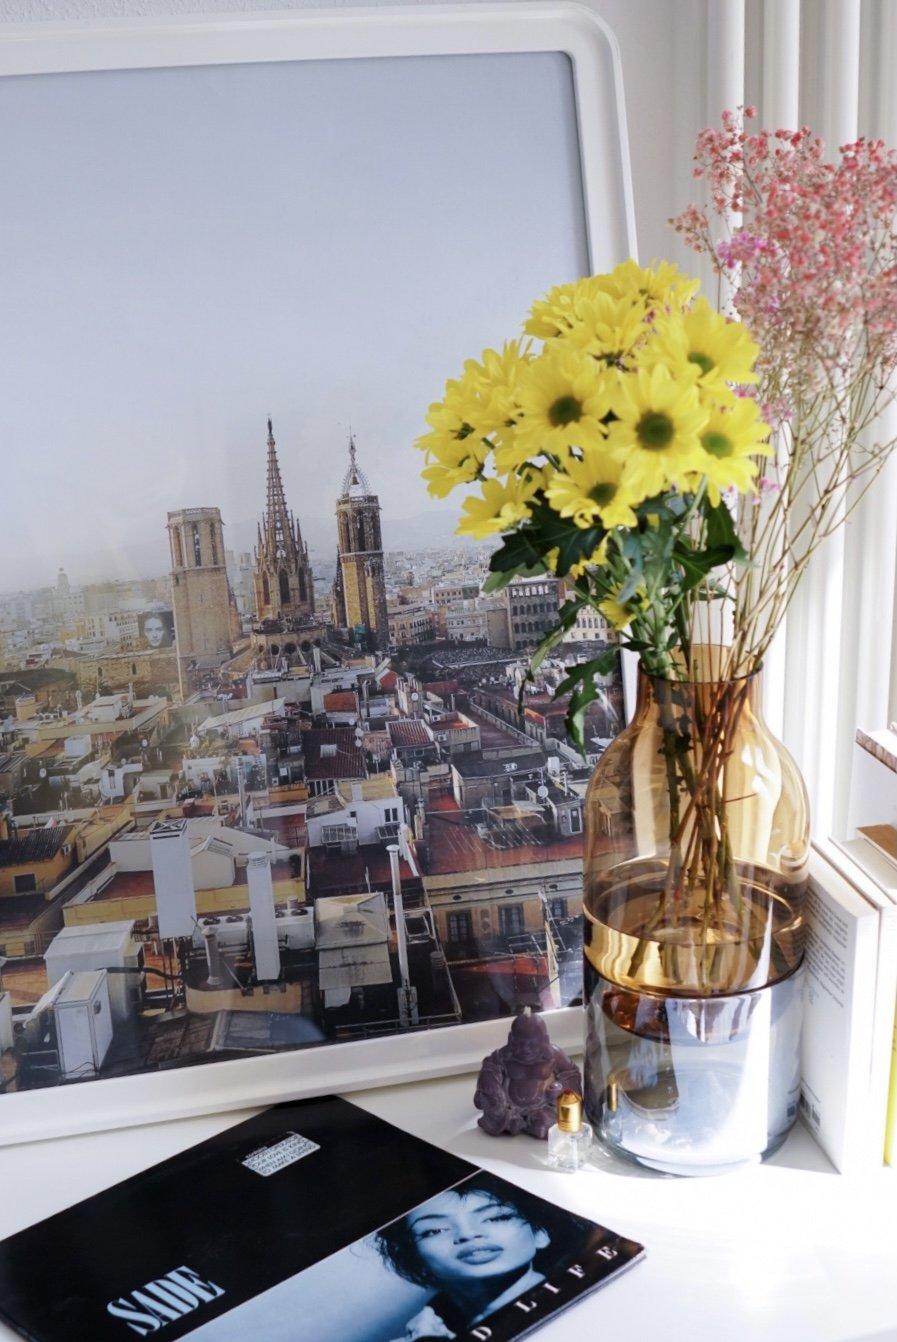 Nowshine-Kolumne-ue40-Blog-Barcelona-Bild-Sade-Diamond Life